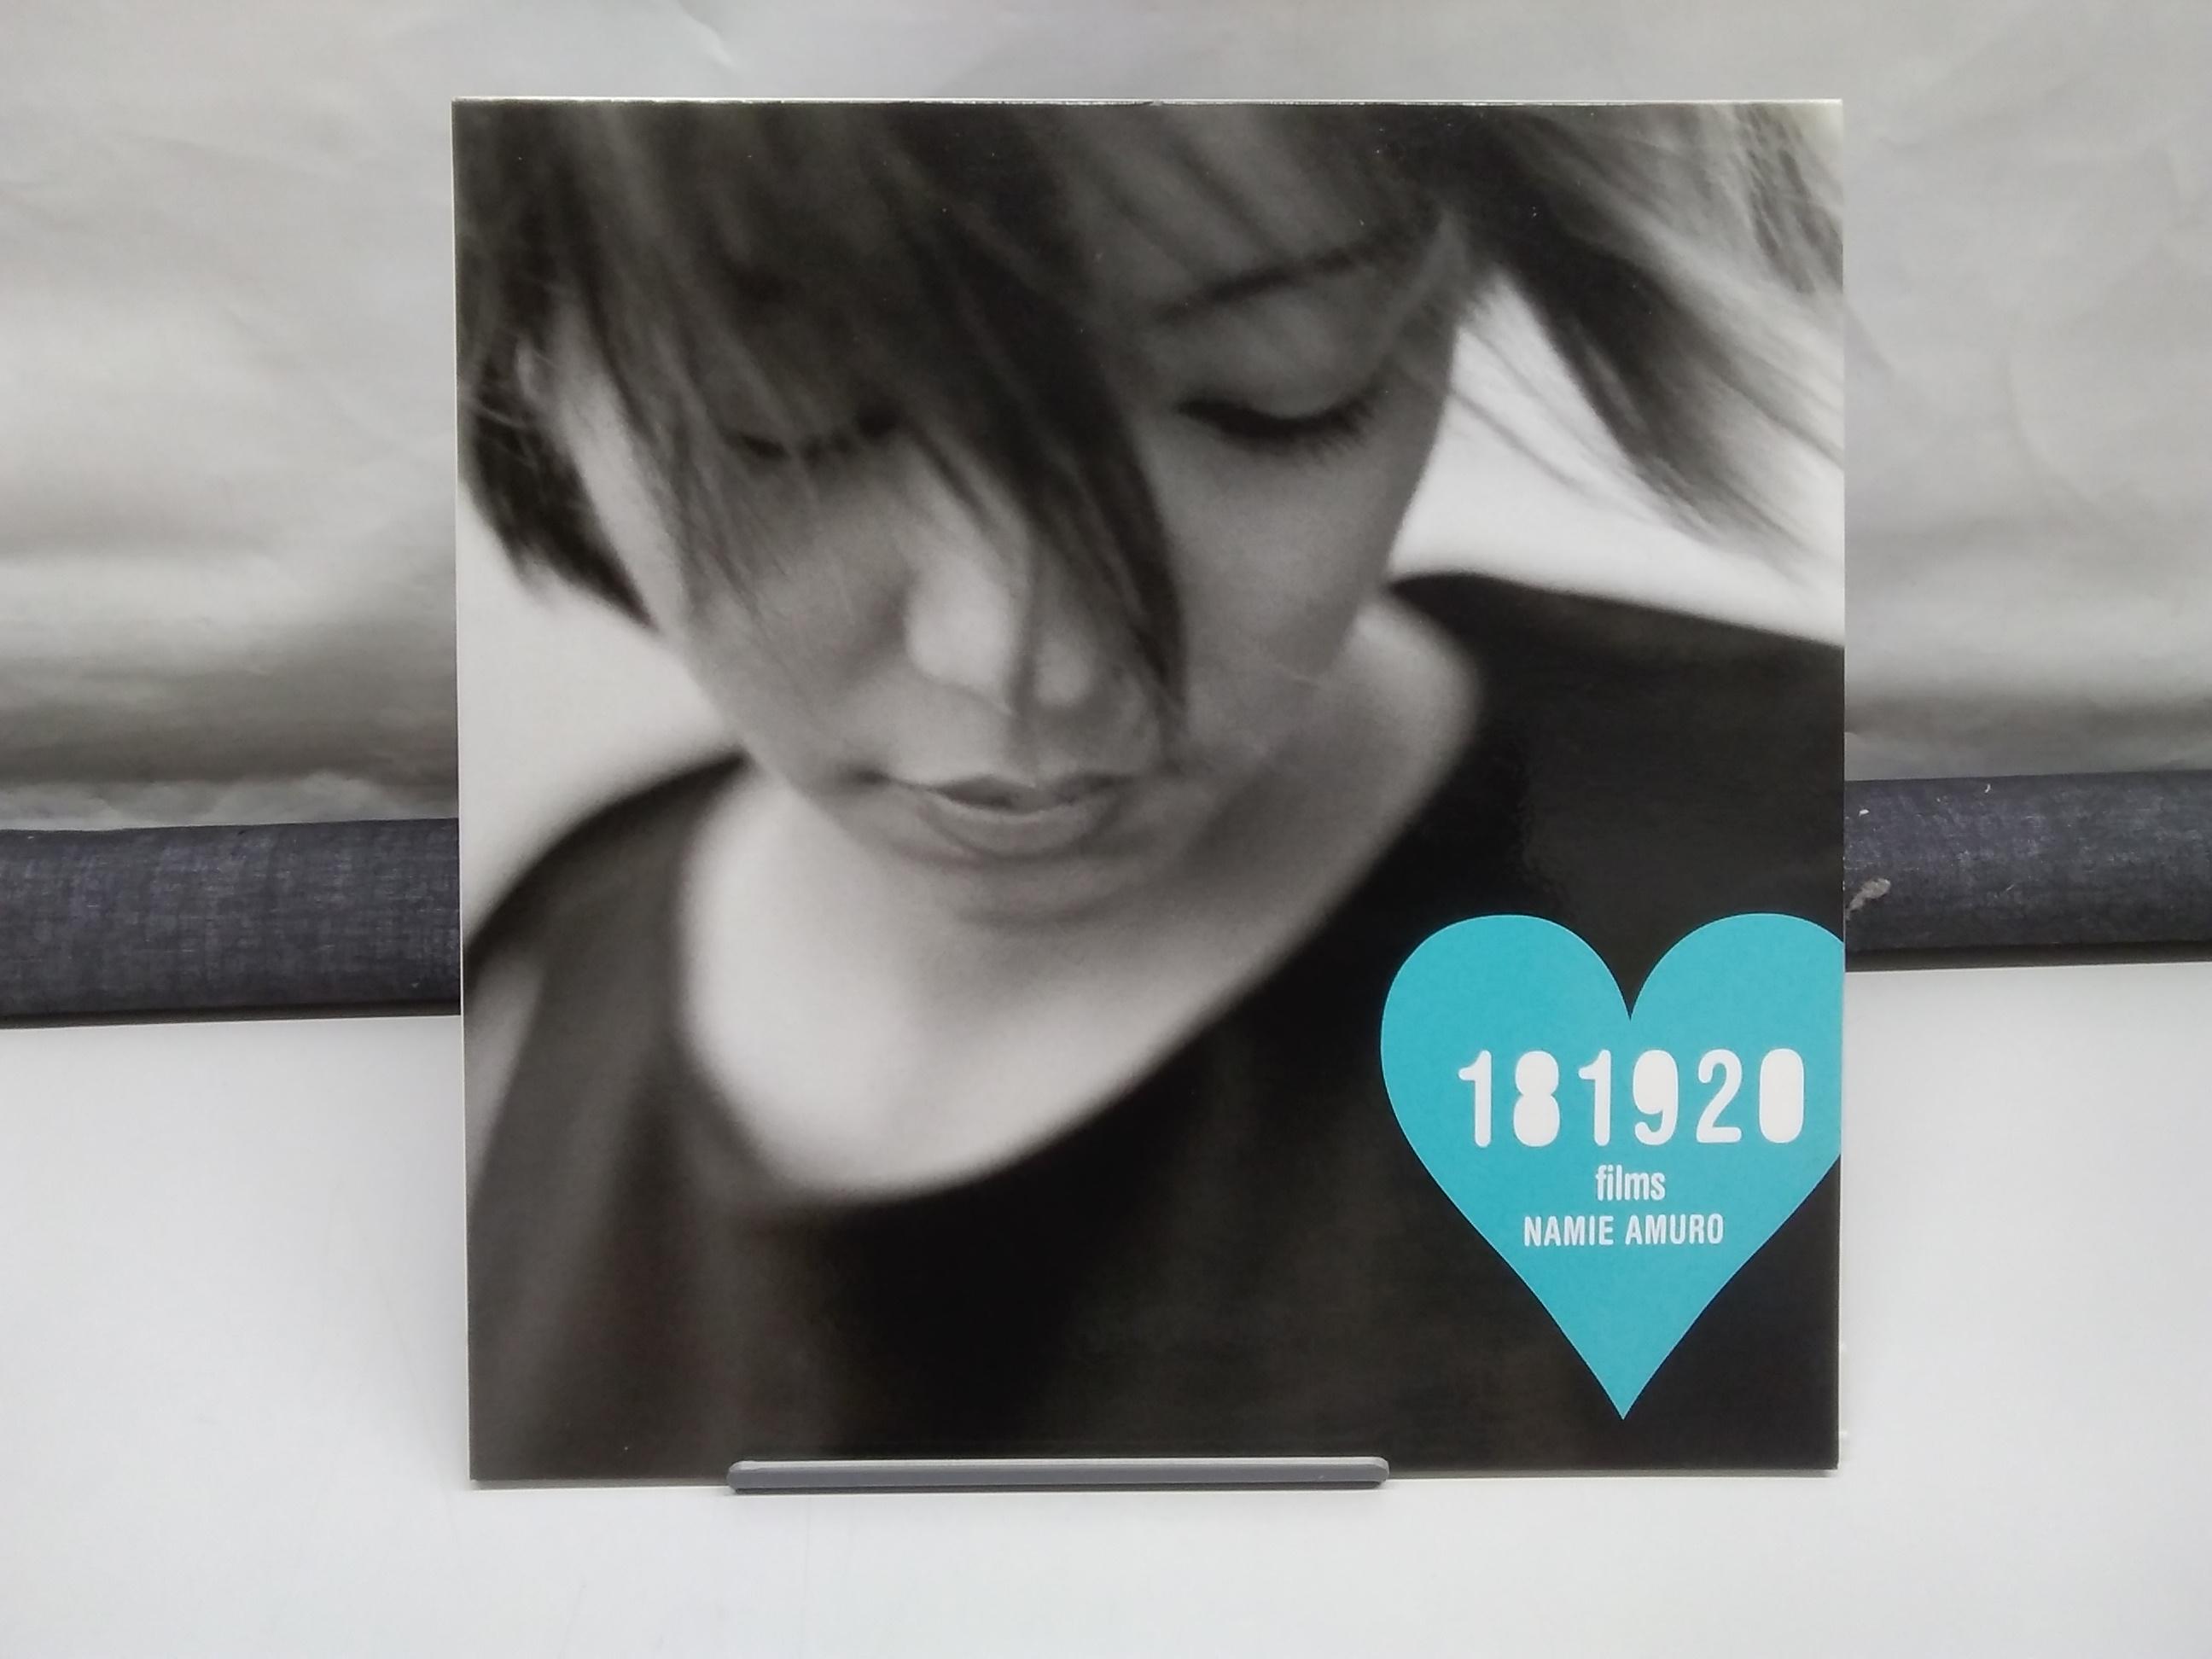 181920 films namie amuro|AVEX TRAX